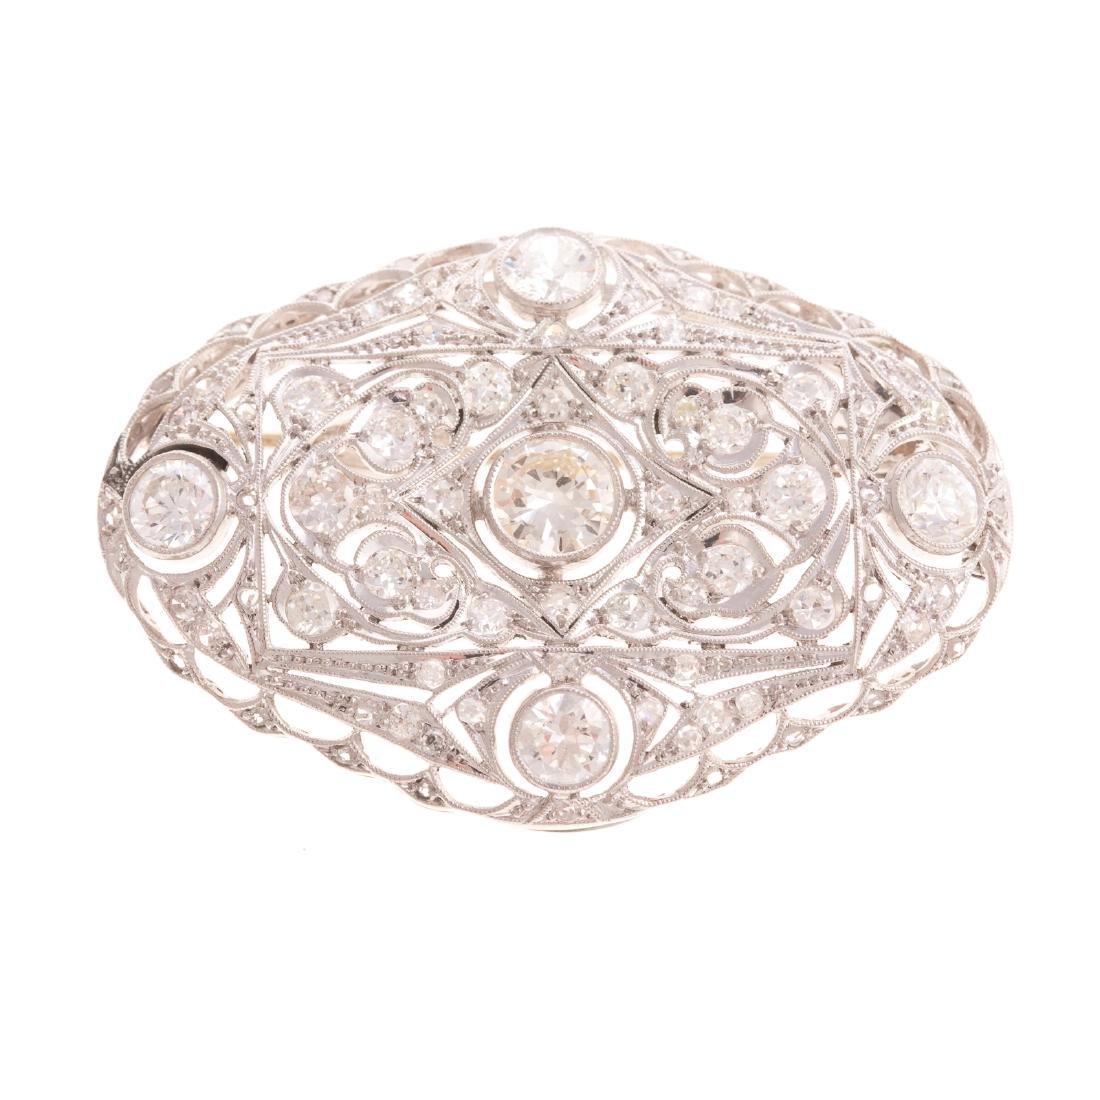 An Art Deco Diamond Filigree Brooch in Platinum